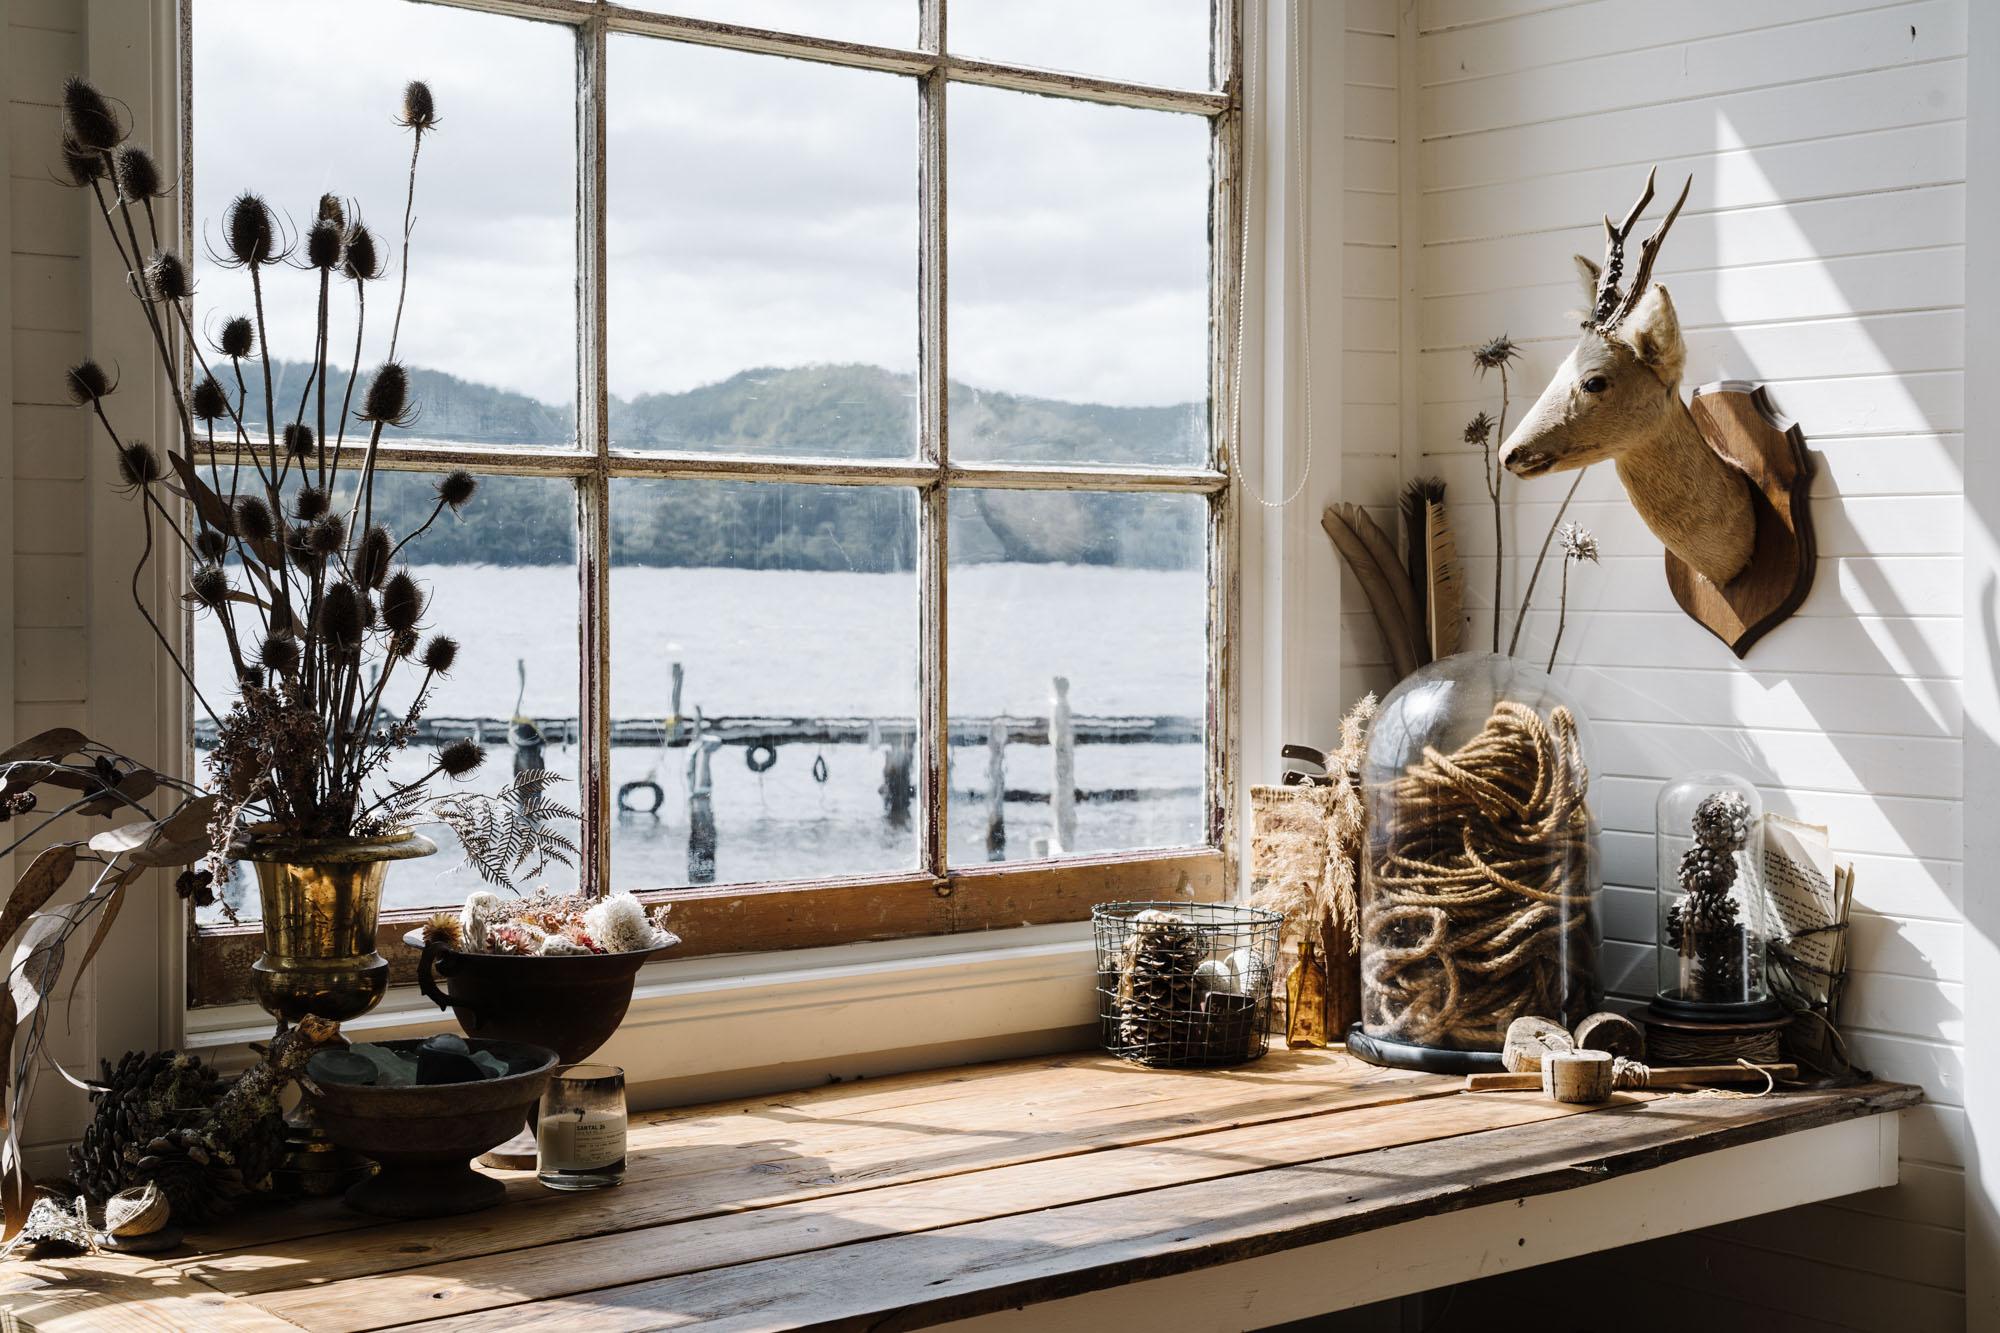 Marnie Hawson, Melbourne interior photographer for Captain's Rest, Strahan